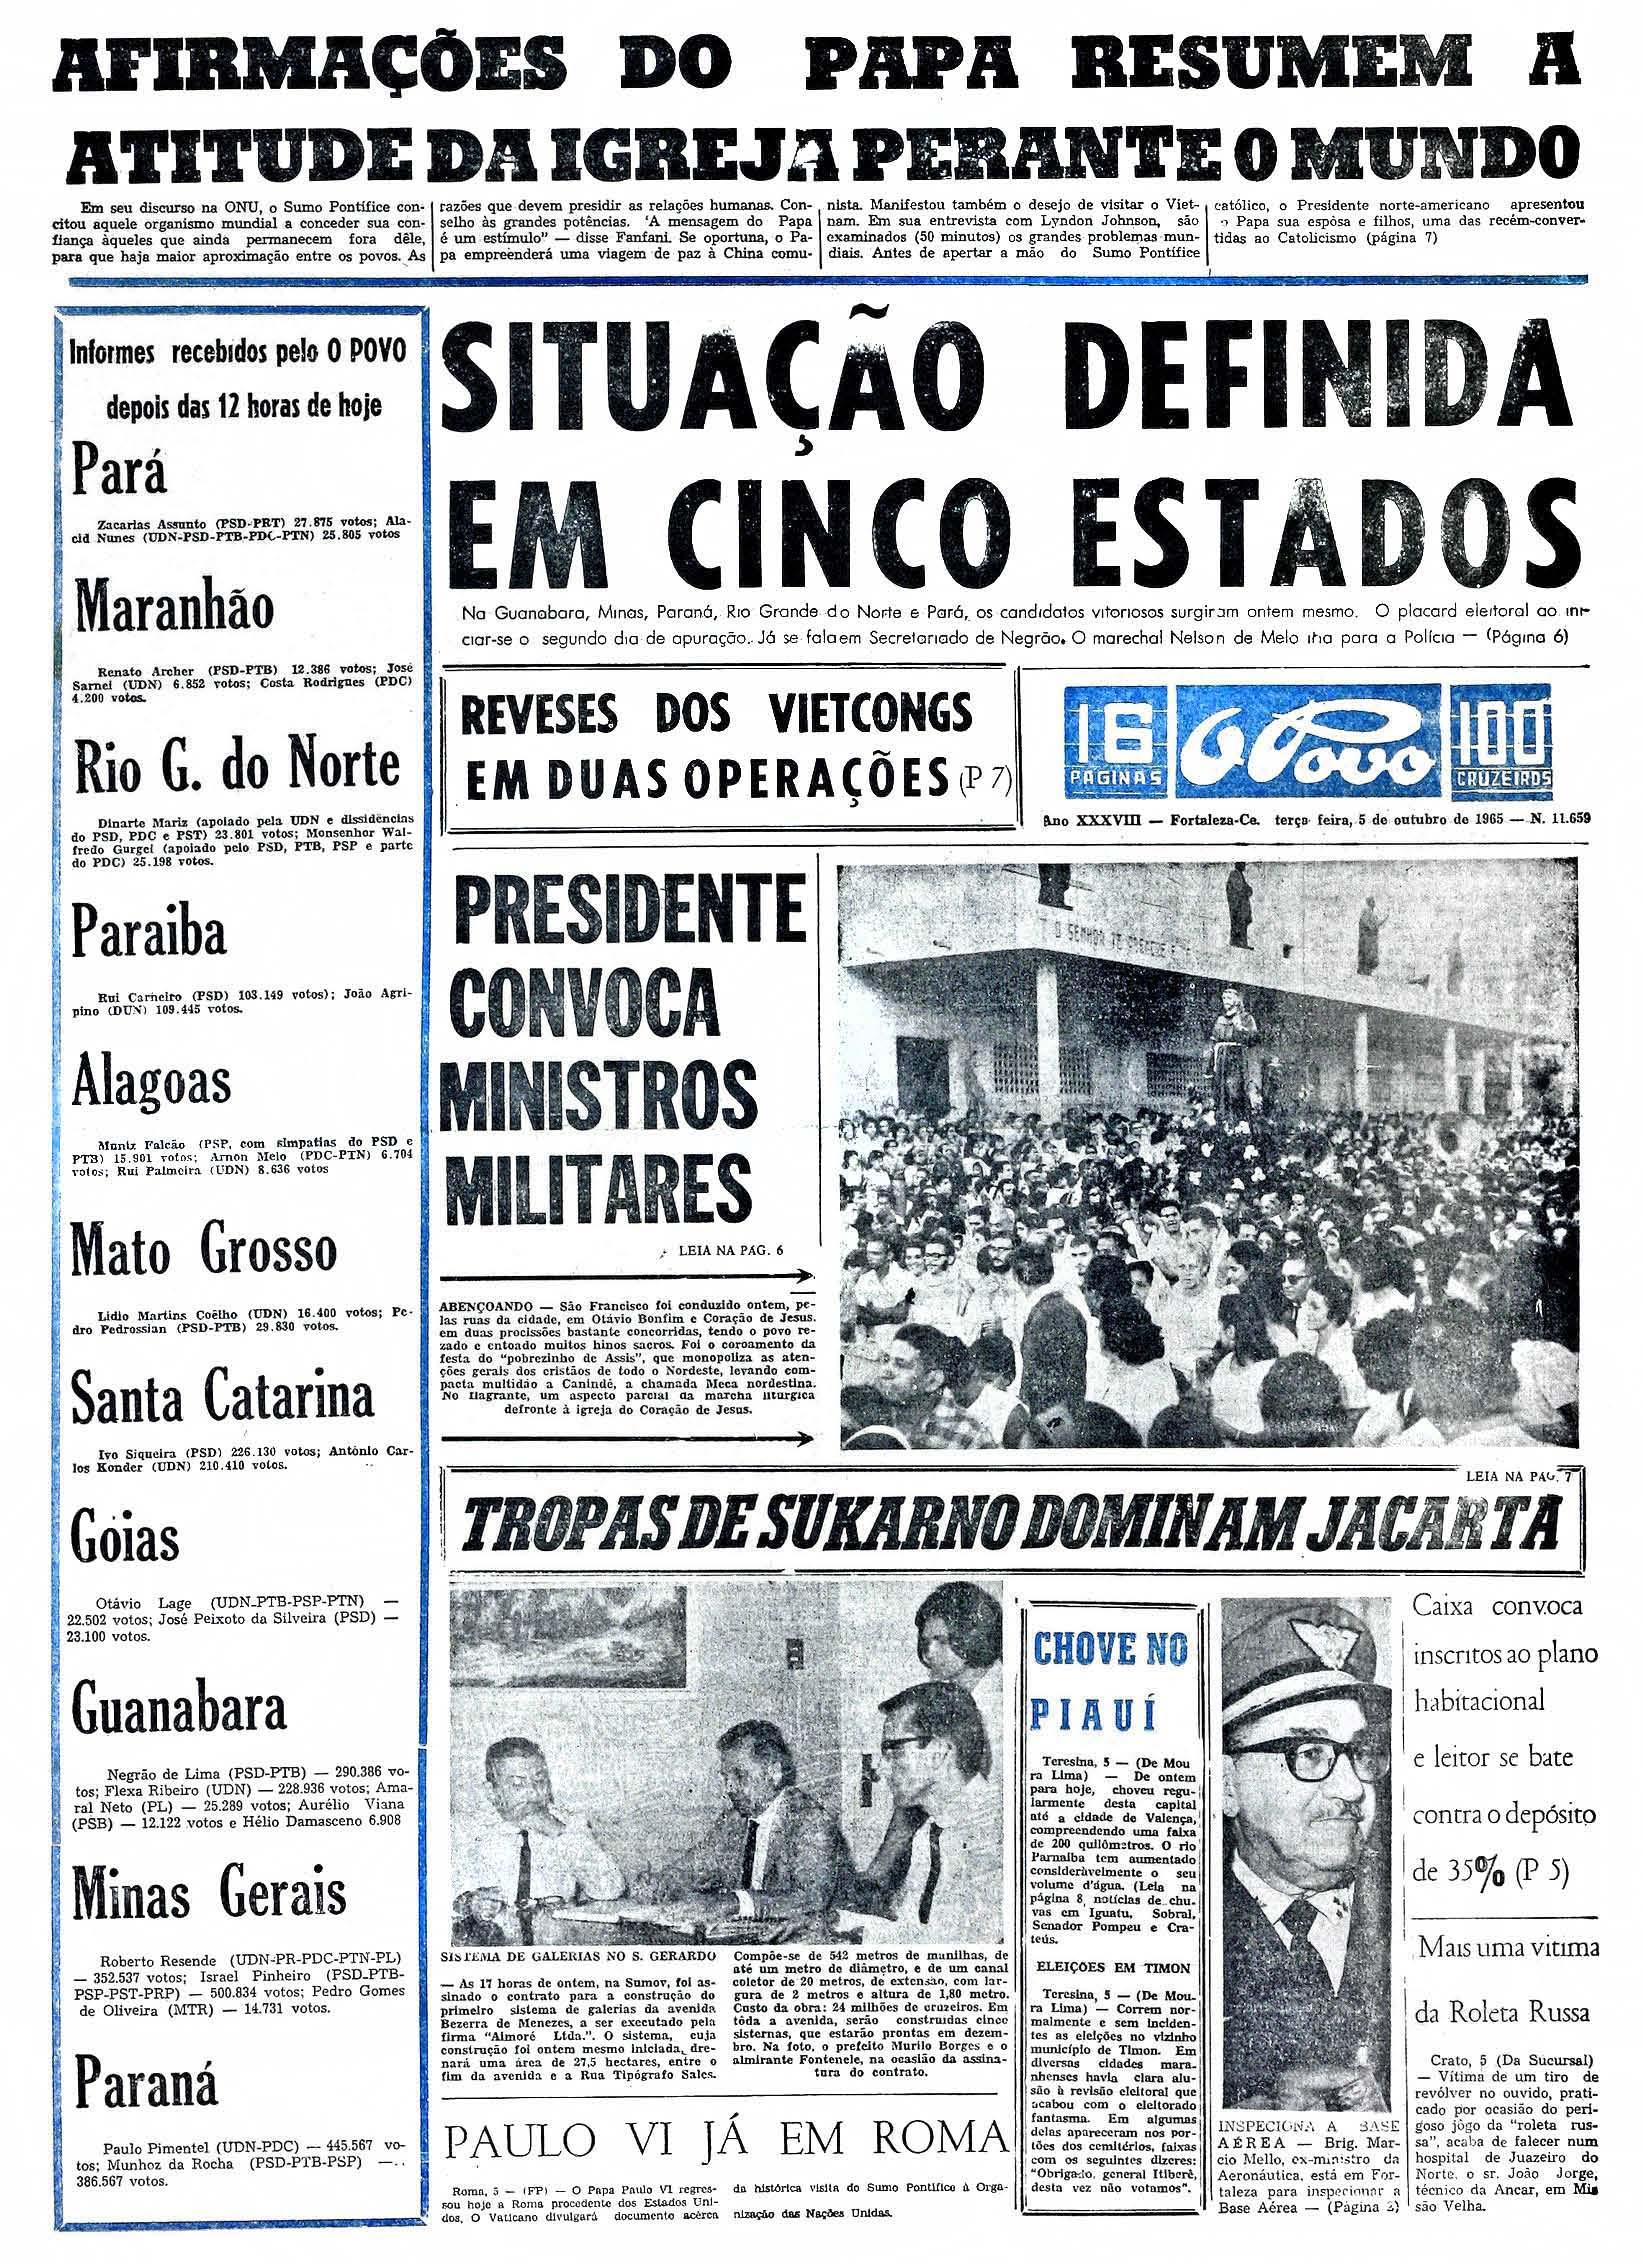 05-10-1965